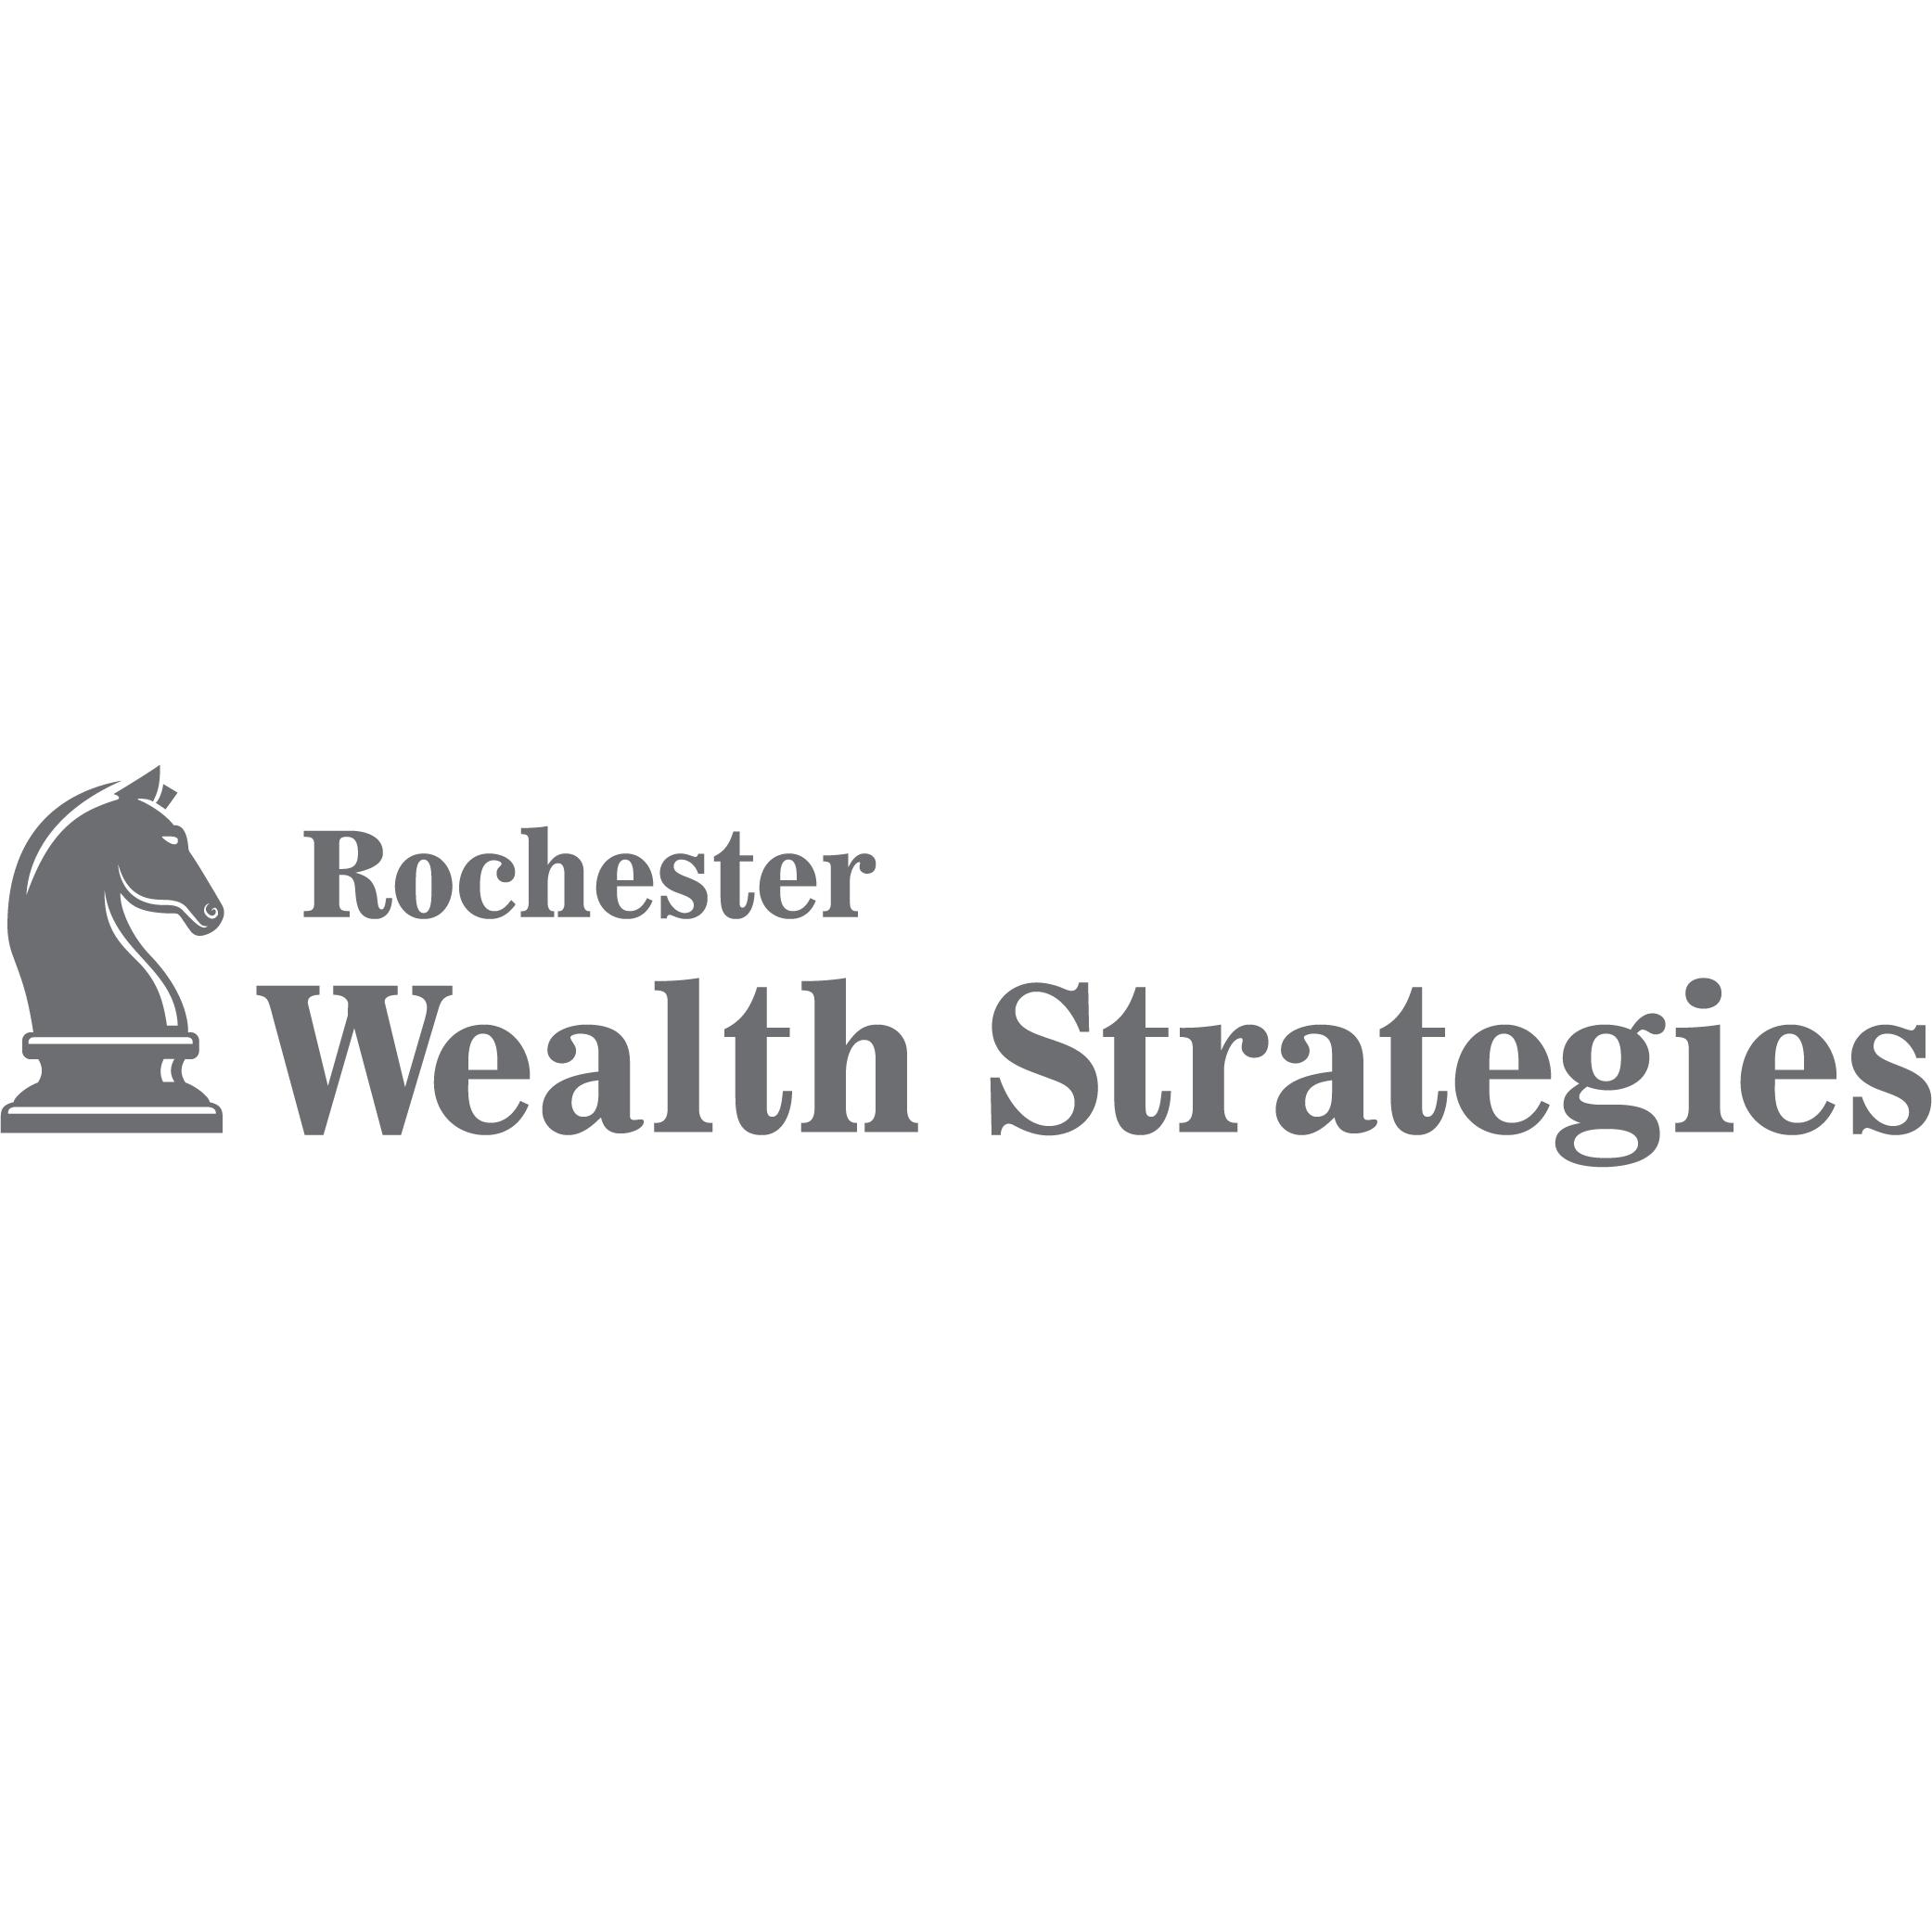 Rochester Wealth Strategies